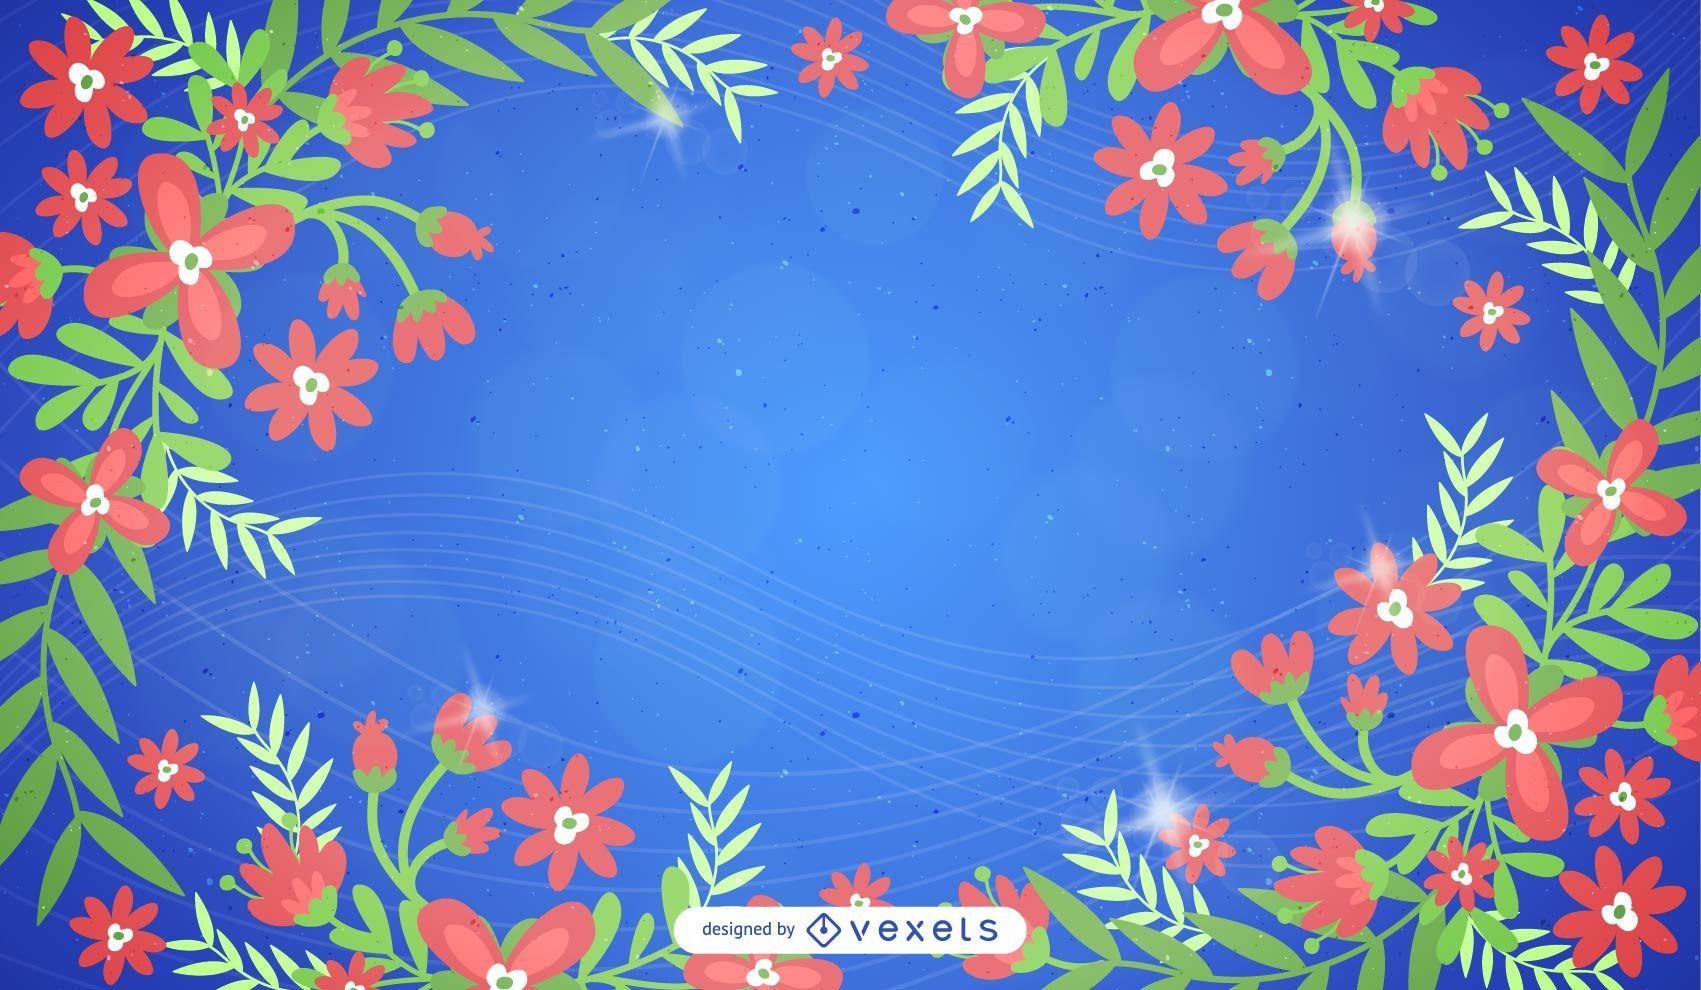 Marco floral remolino sobre fondo azul claro